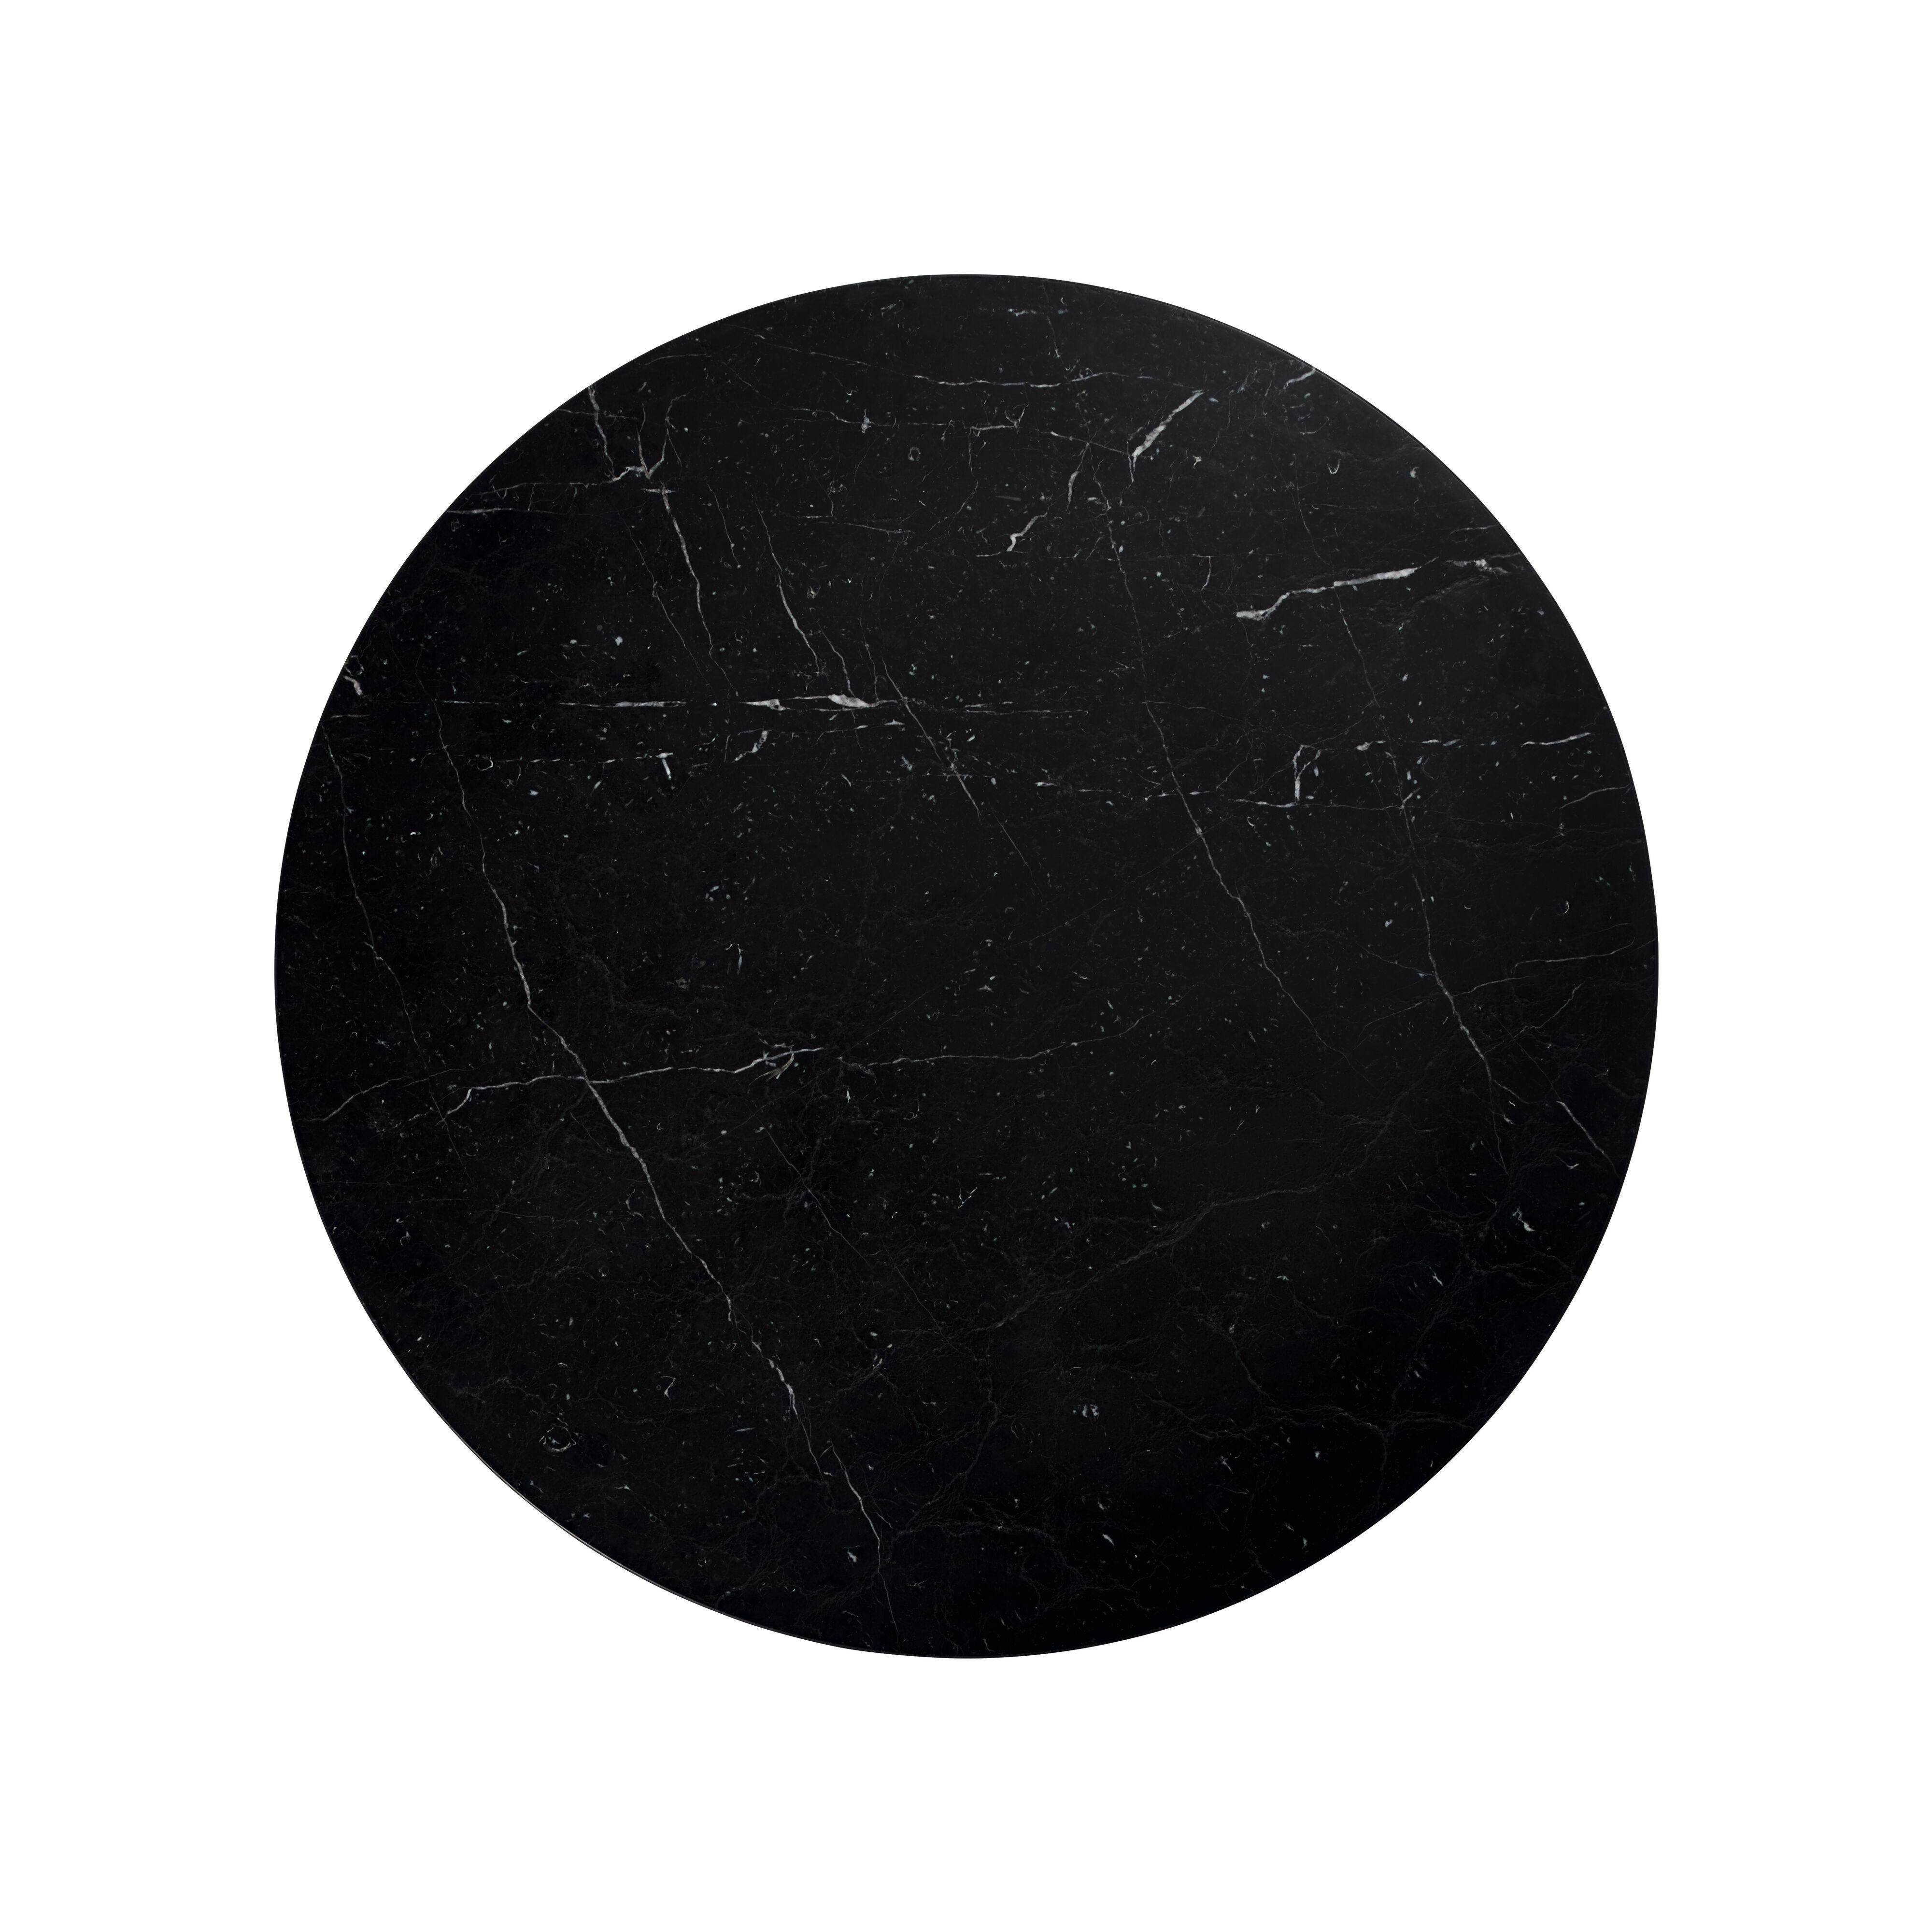 02-WK-Joco_Stone-0003-H.tif